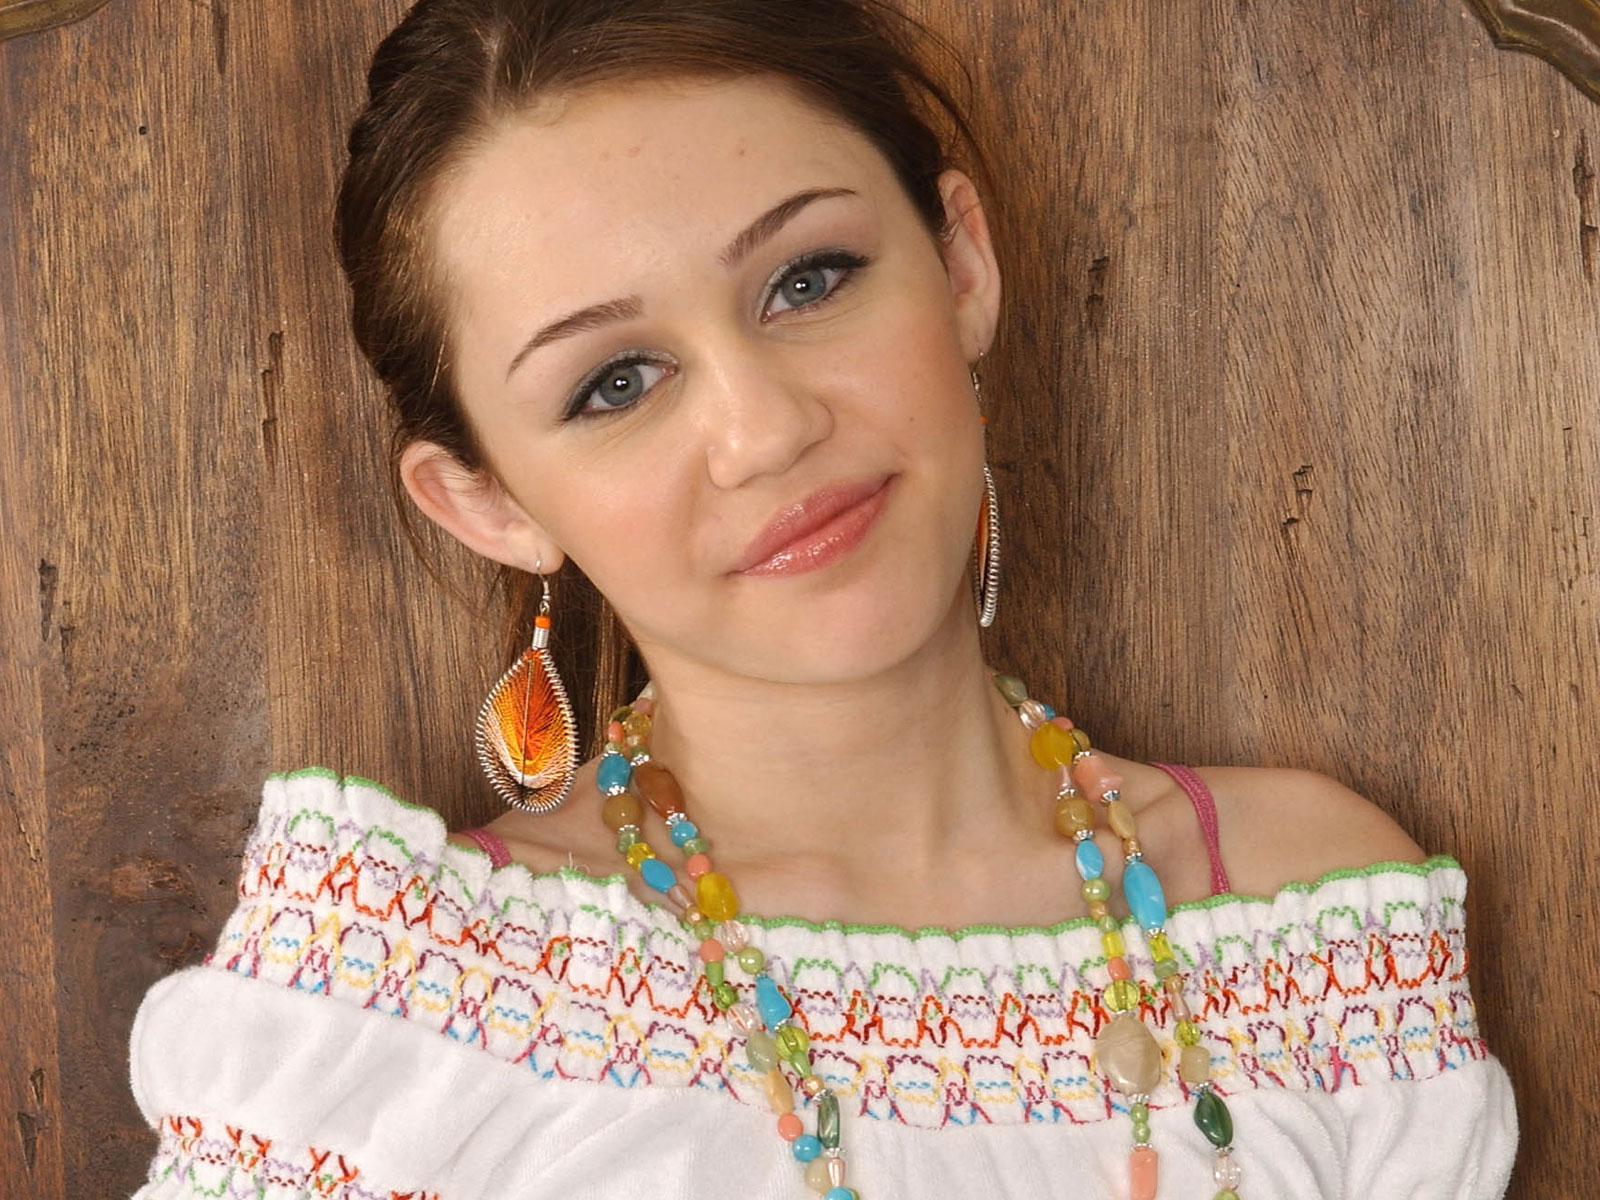 Miley Cyrus: Miley Cyrus HD Wallpapers